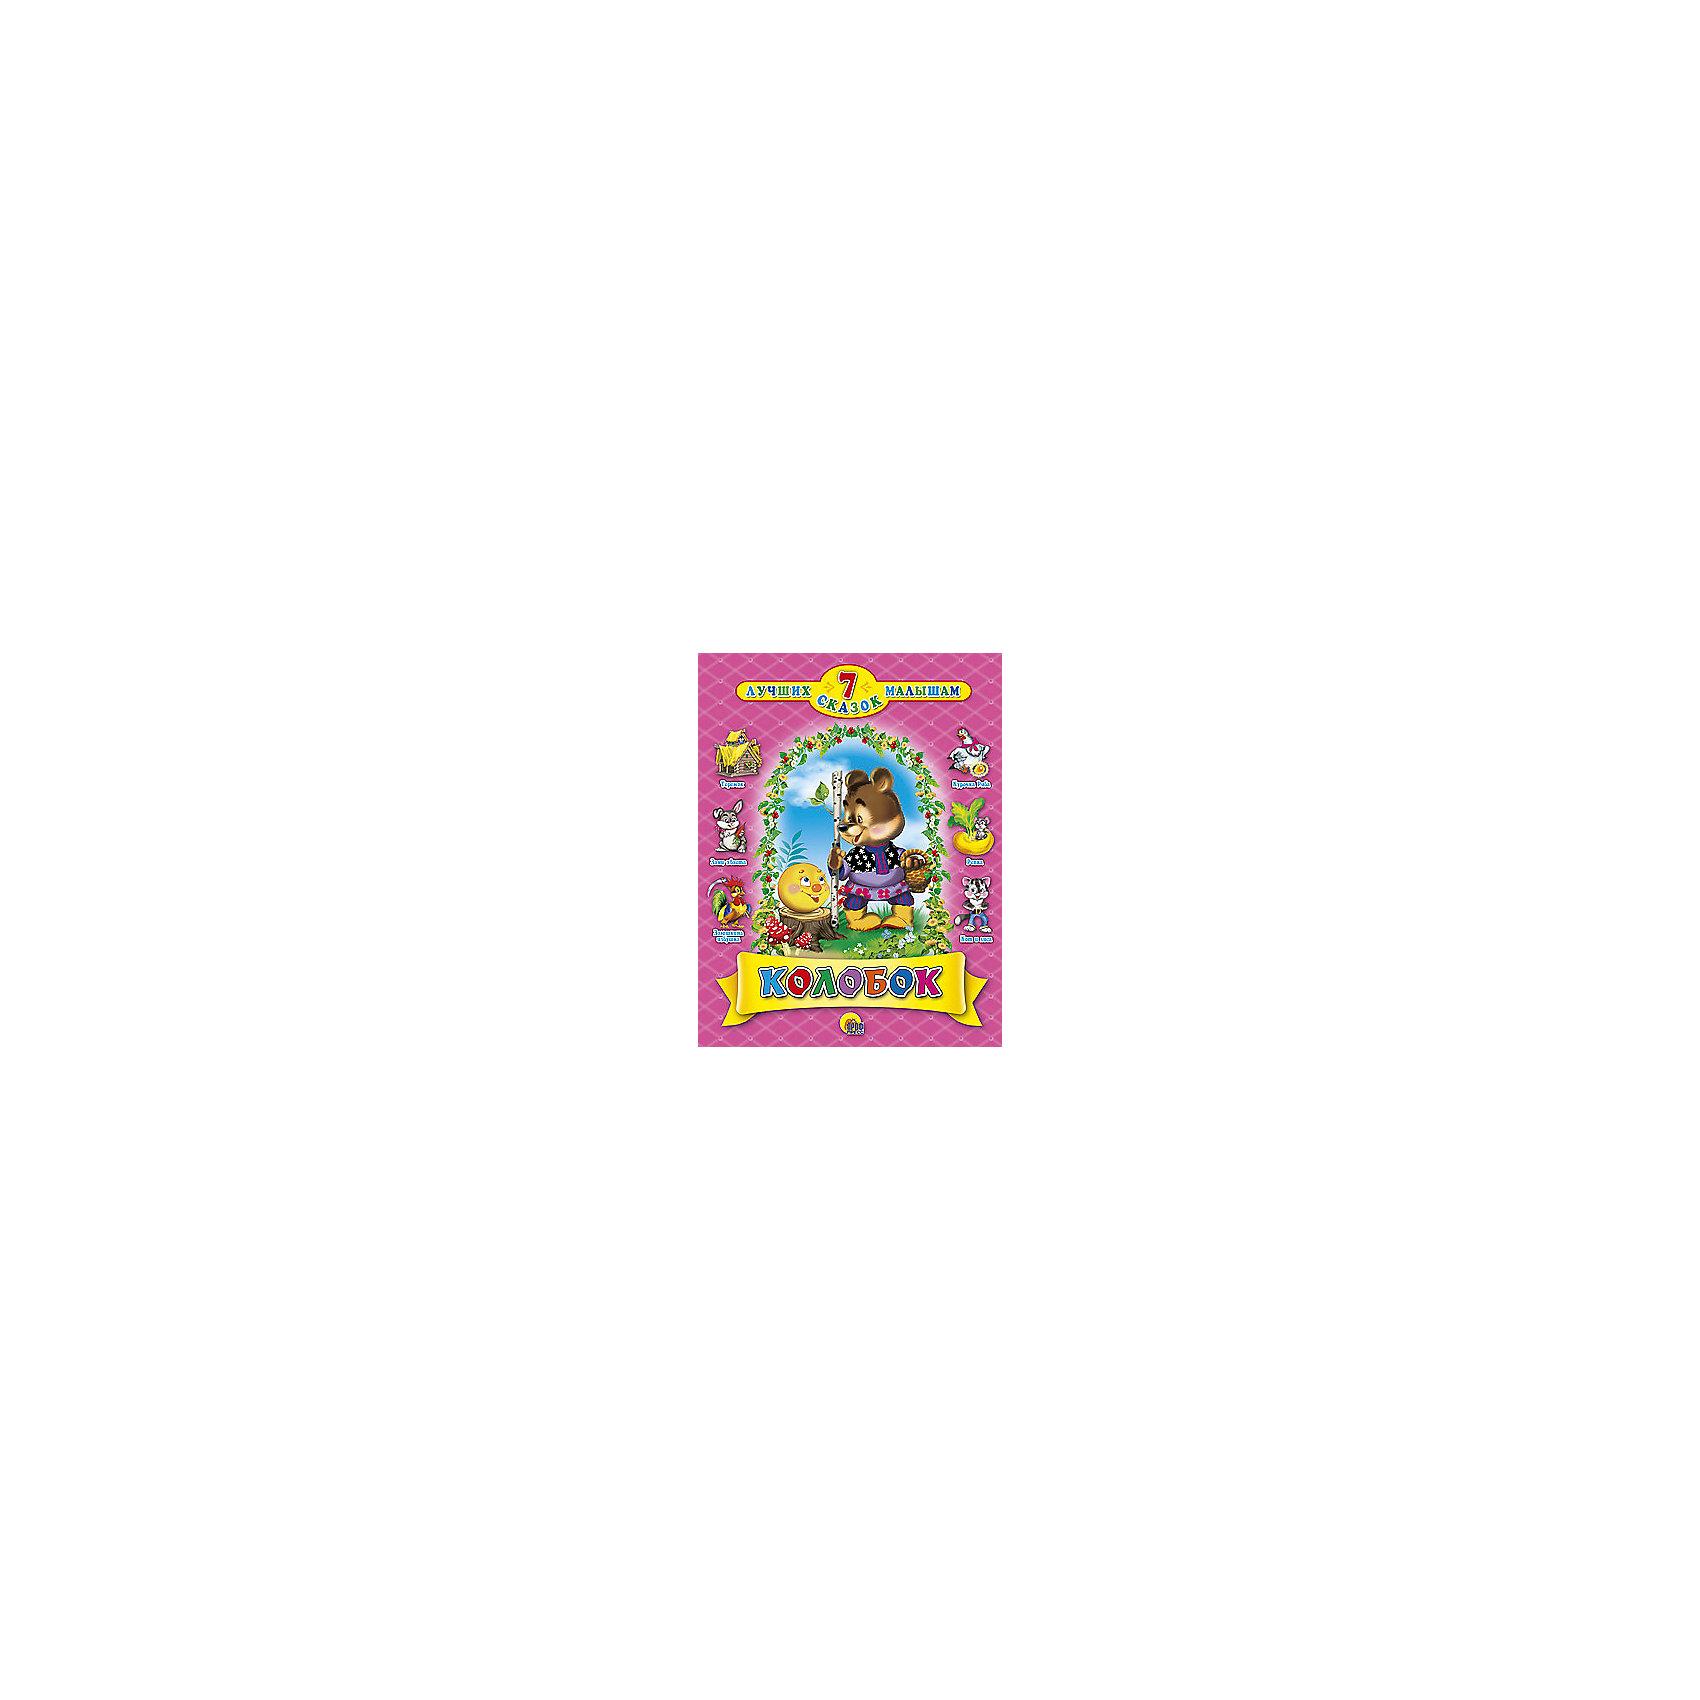 Проф-Пресс Колобок (10 шт), 7 сказок книги проф пресс 10 сказок курочка ряба